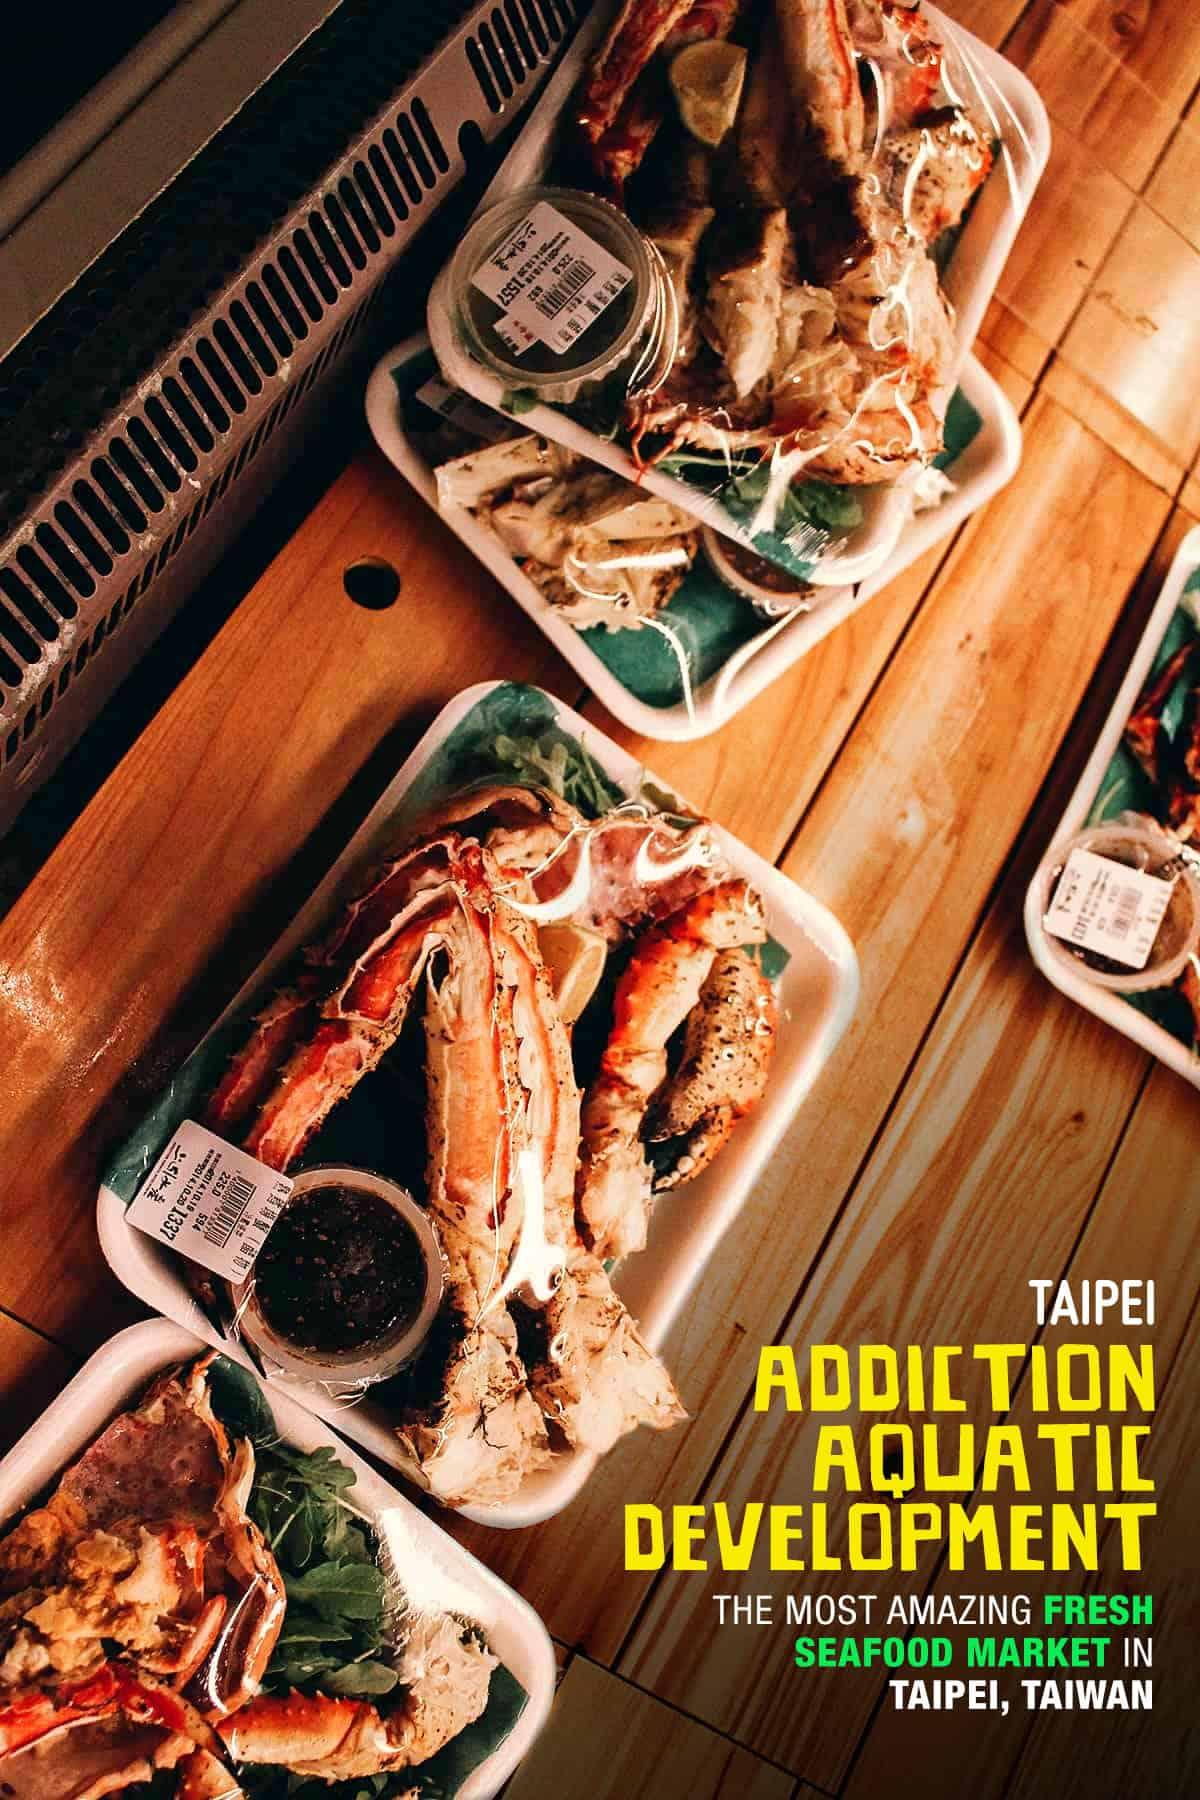 Addiction Aquatic Development: The Most Amazing Fresh